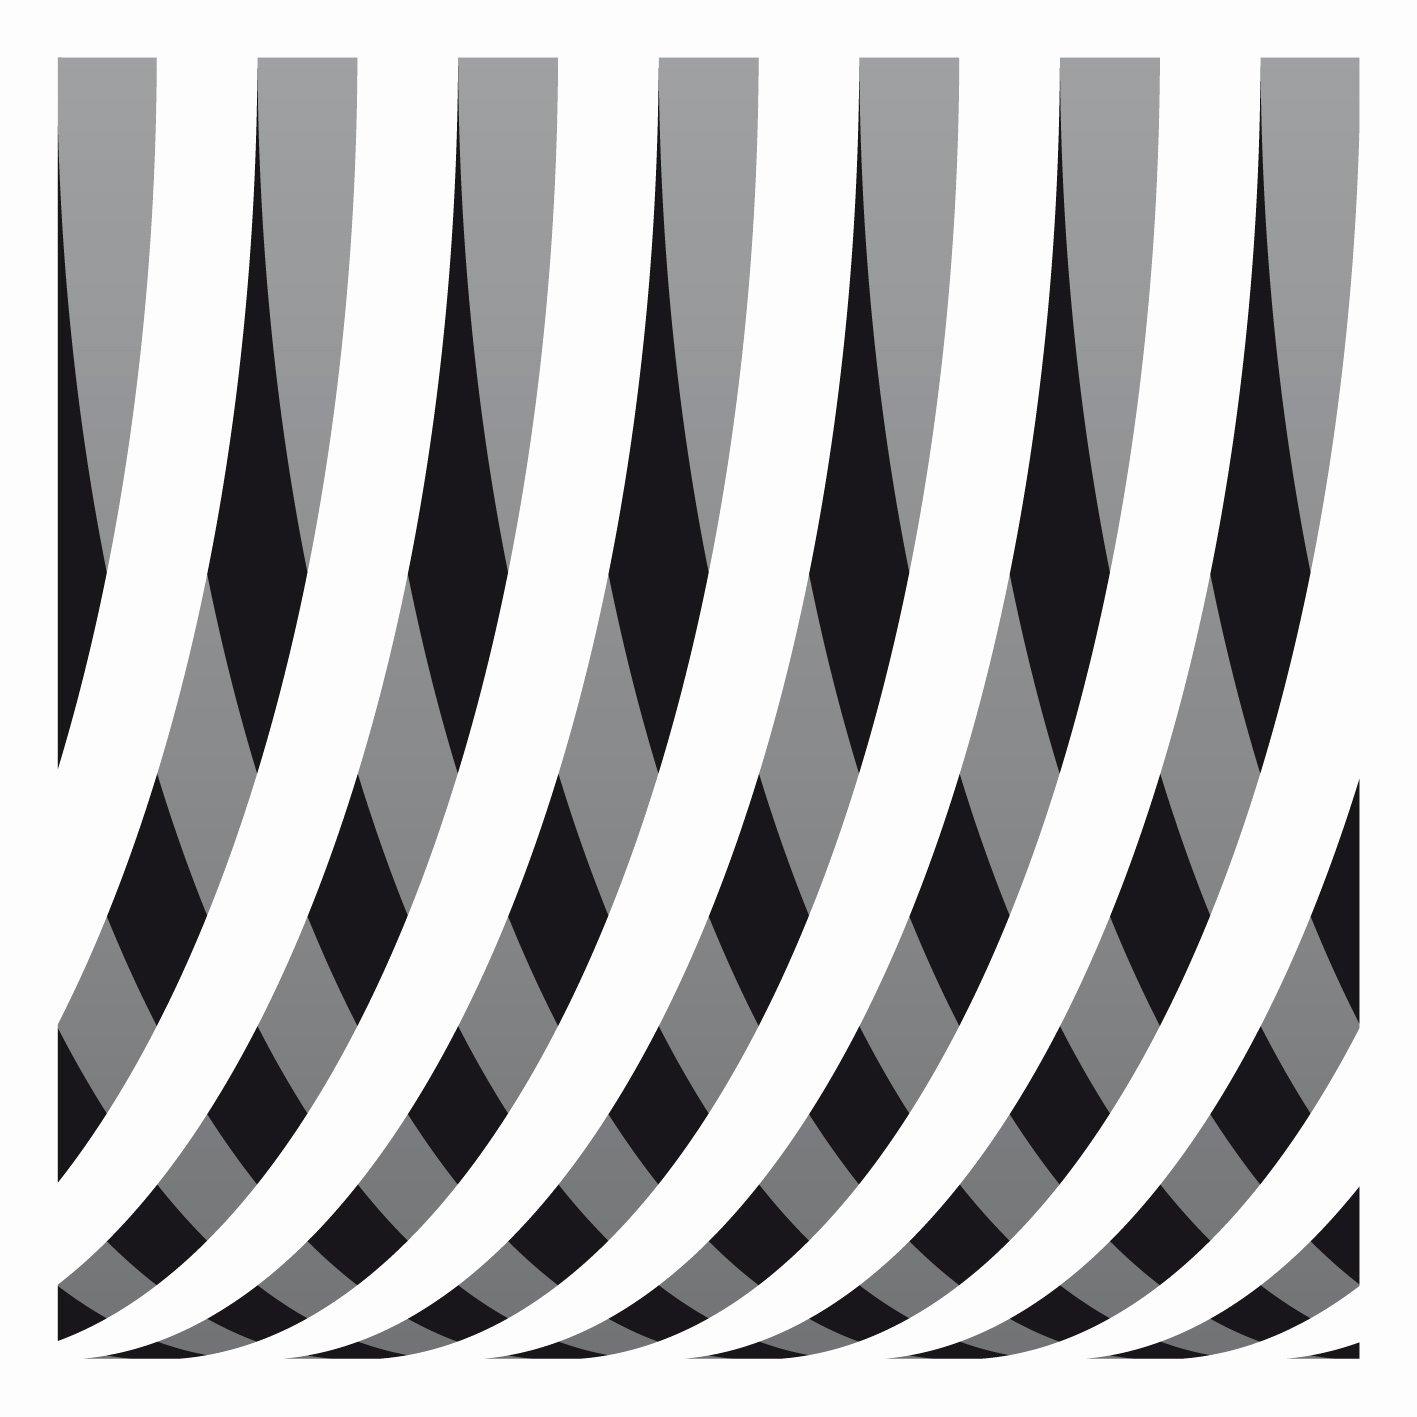 Black and White Designs Art Inspirational Op Art Grasshoppermind